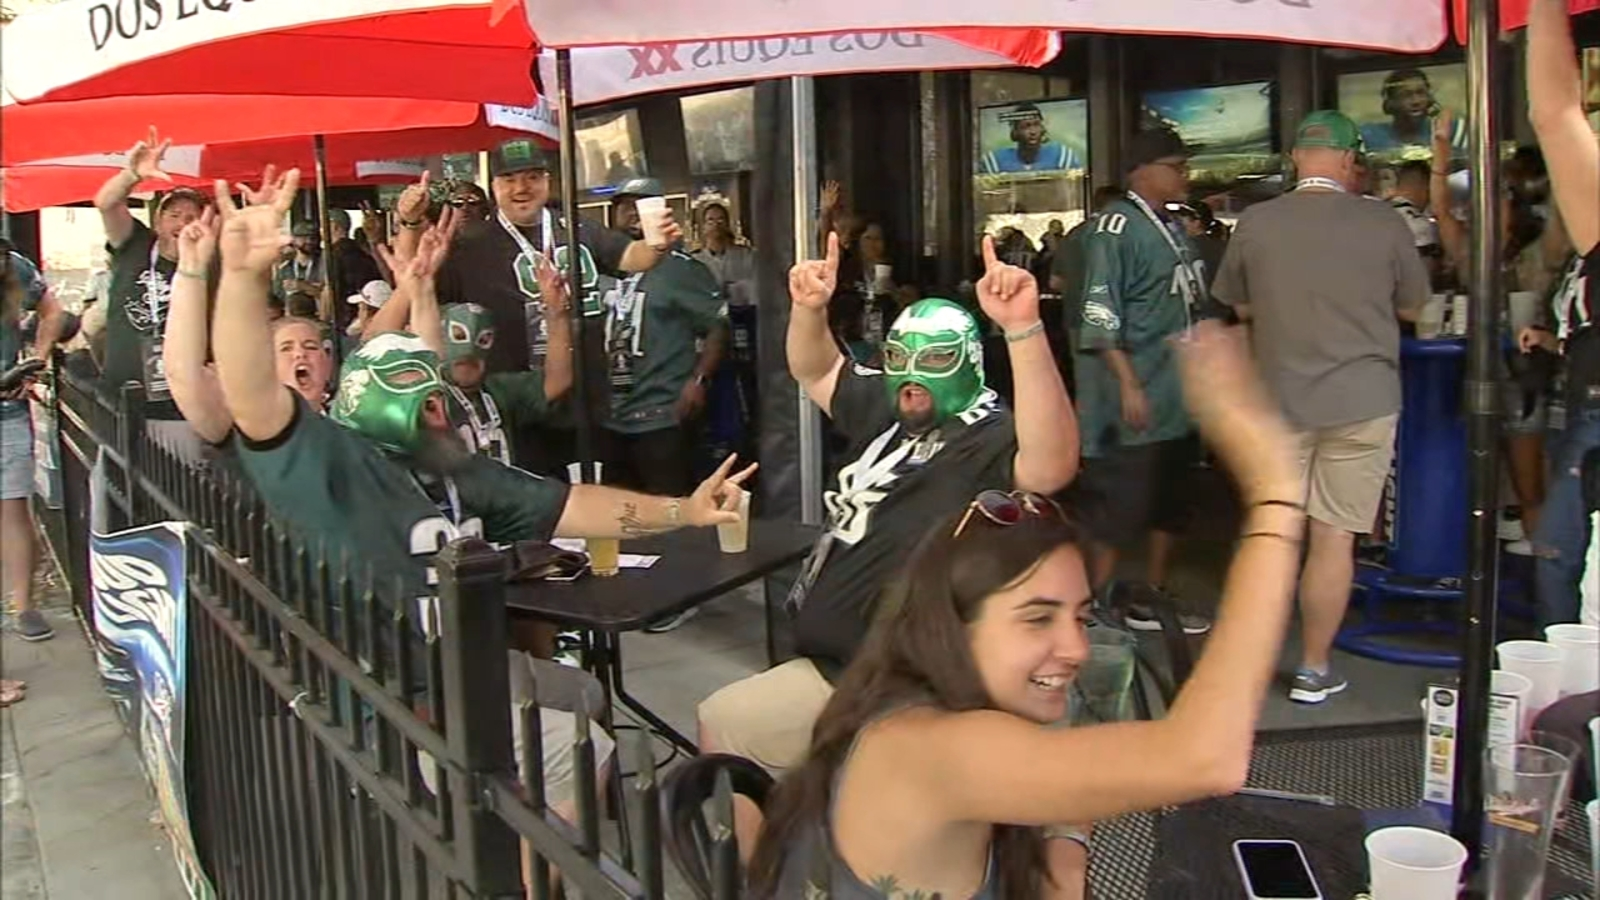 Hundreds of Eagles fans take over Atlanta bar ahead of Sunday Night Football